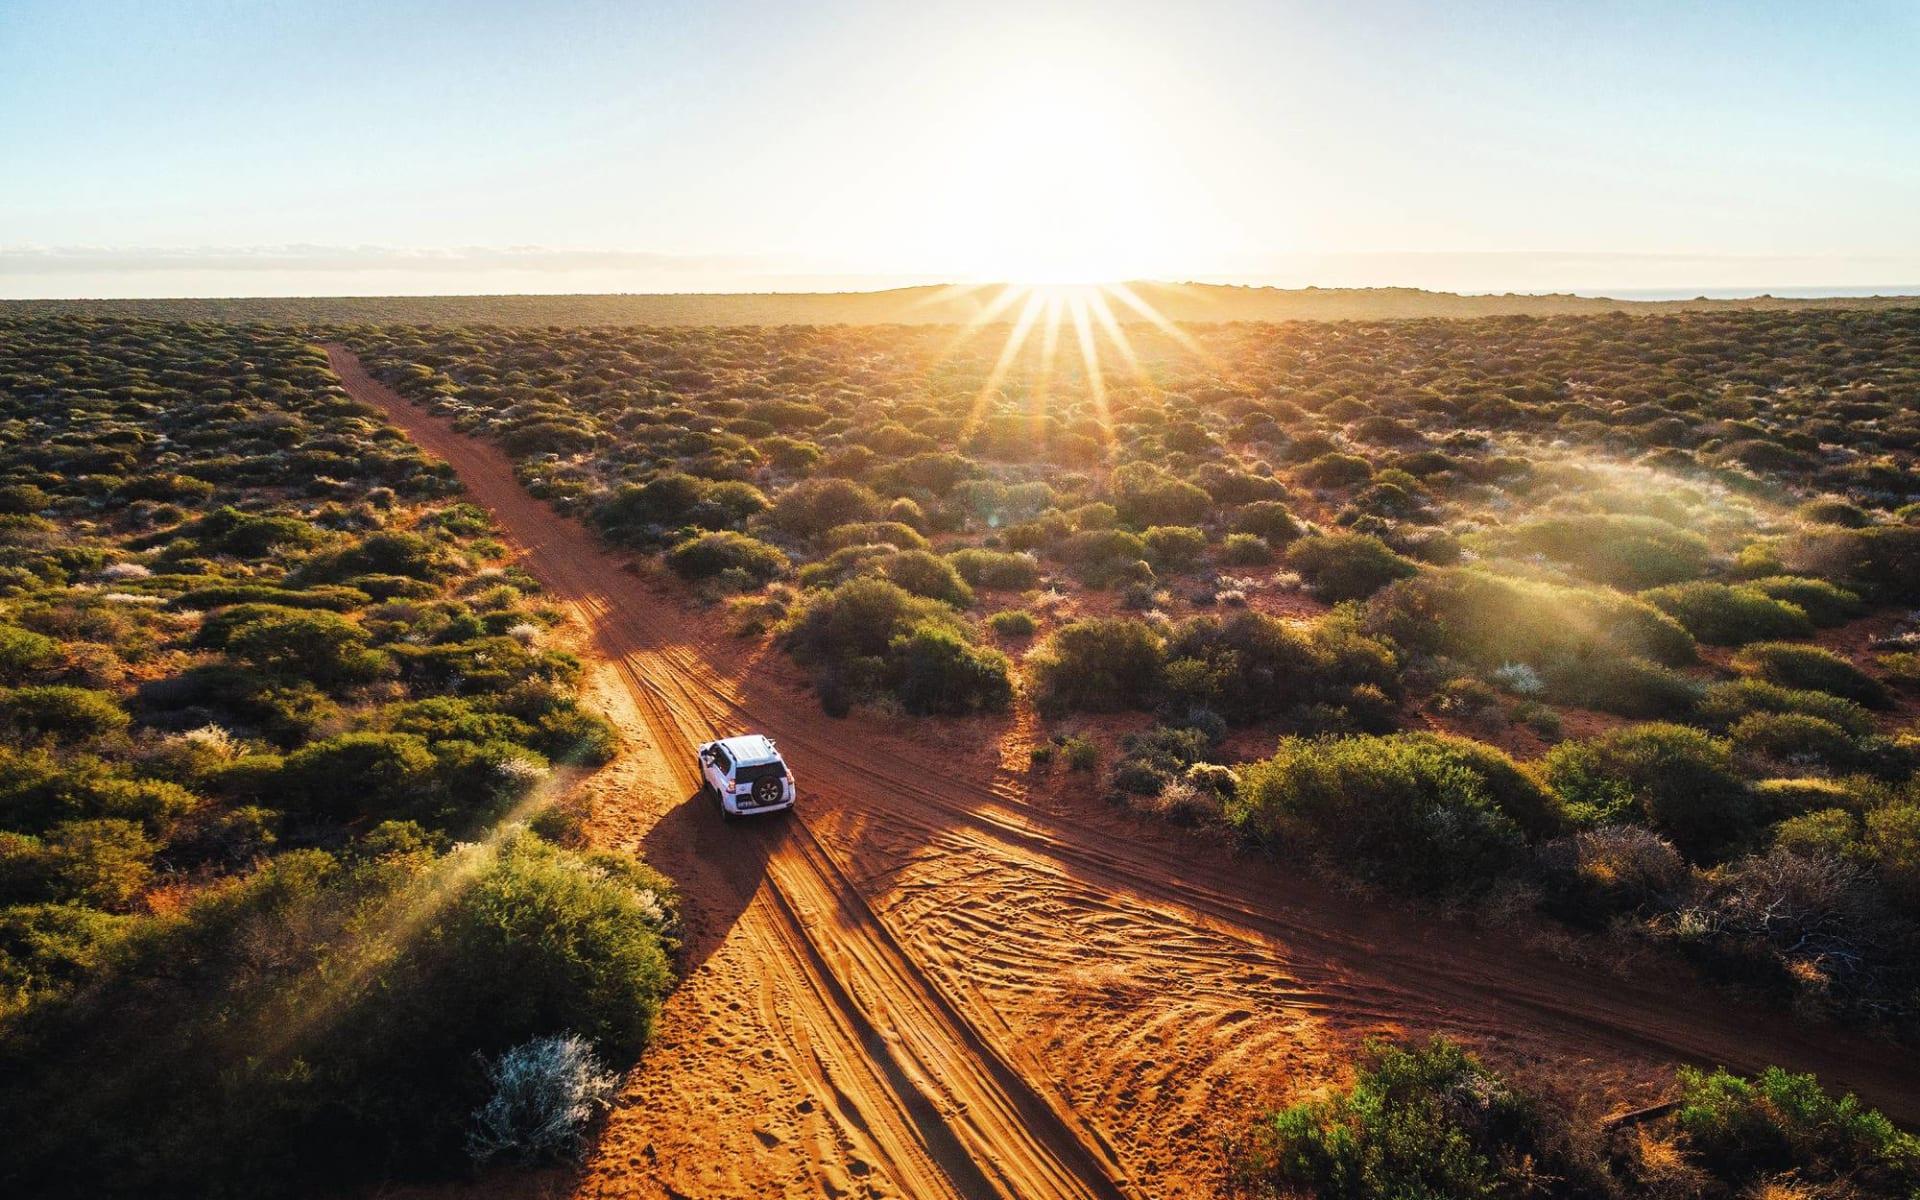 Emu Walk Apartments in Ayers Rock - Yulara: Natur Outback Australien  Strasse mit Sonnenuntergang  c shutterstock_681062968 2017